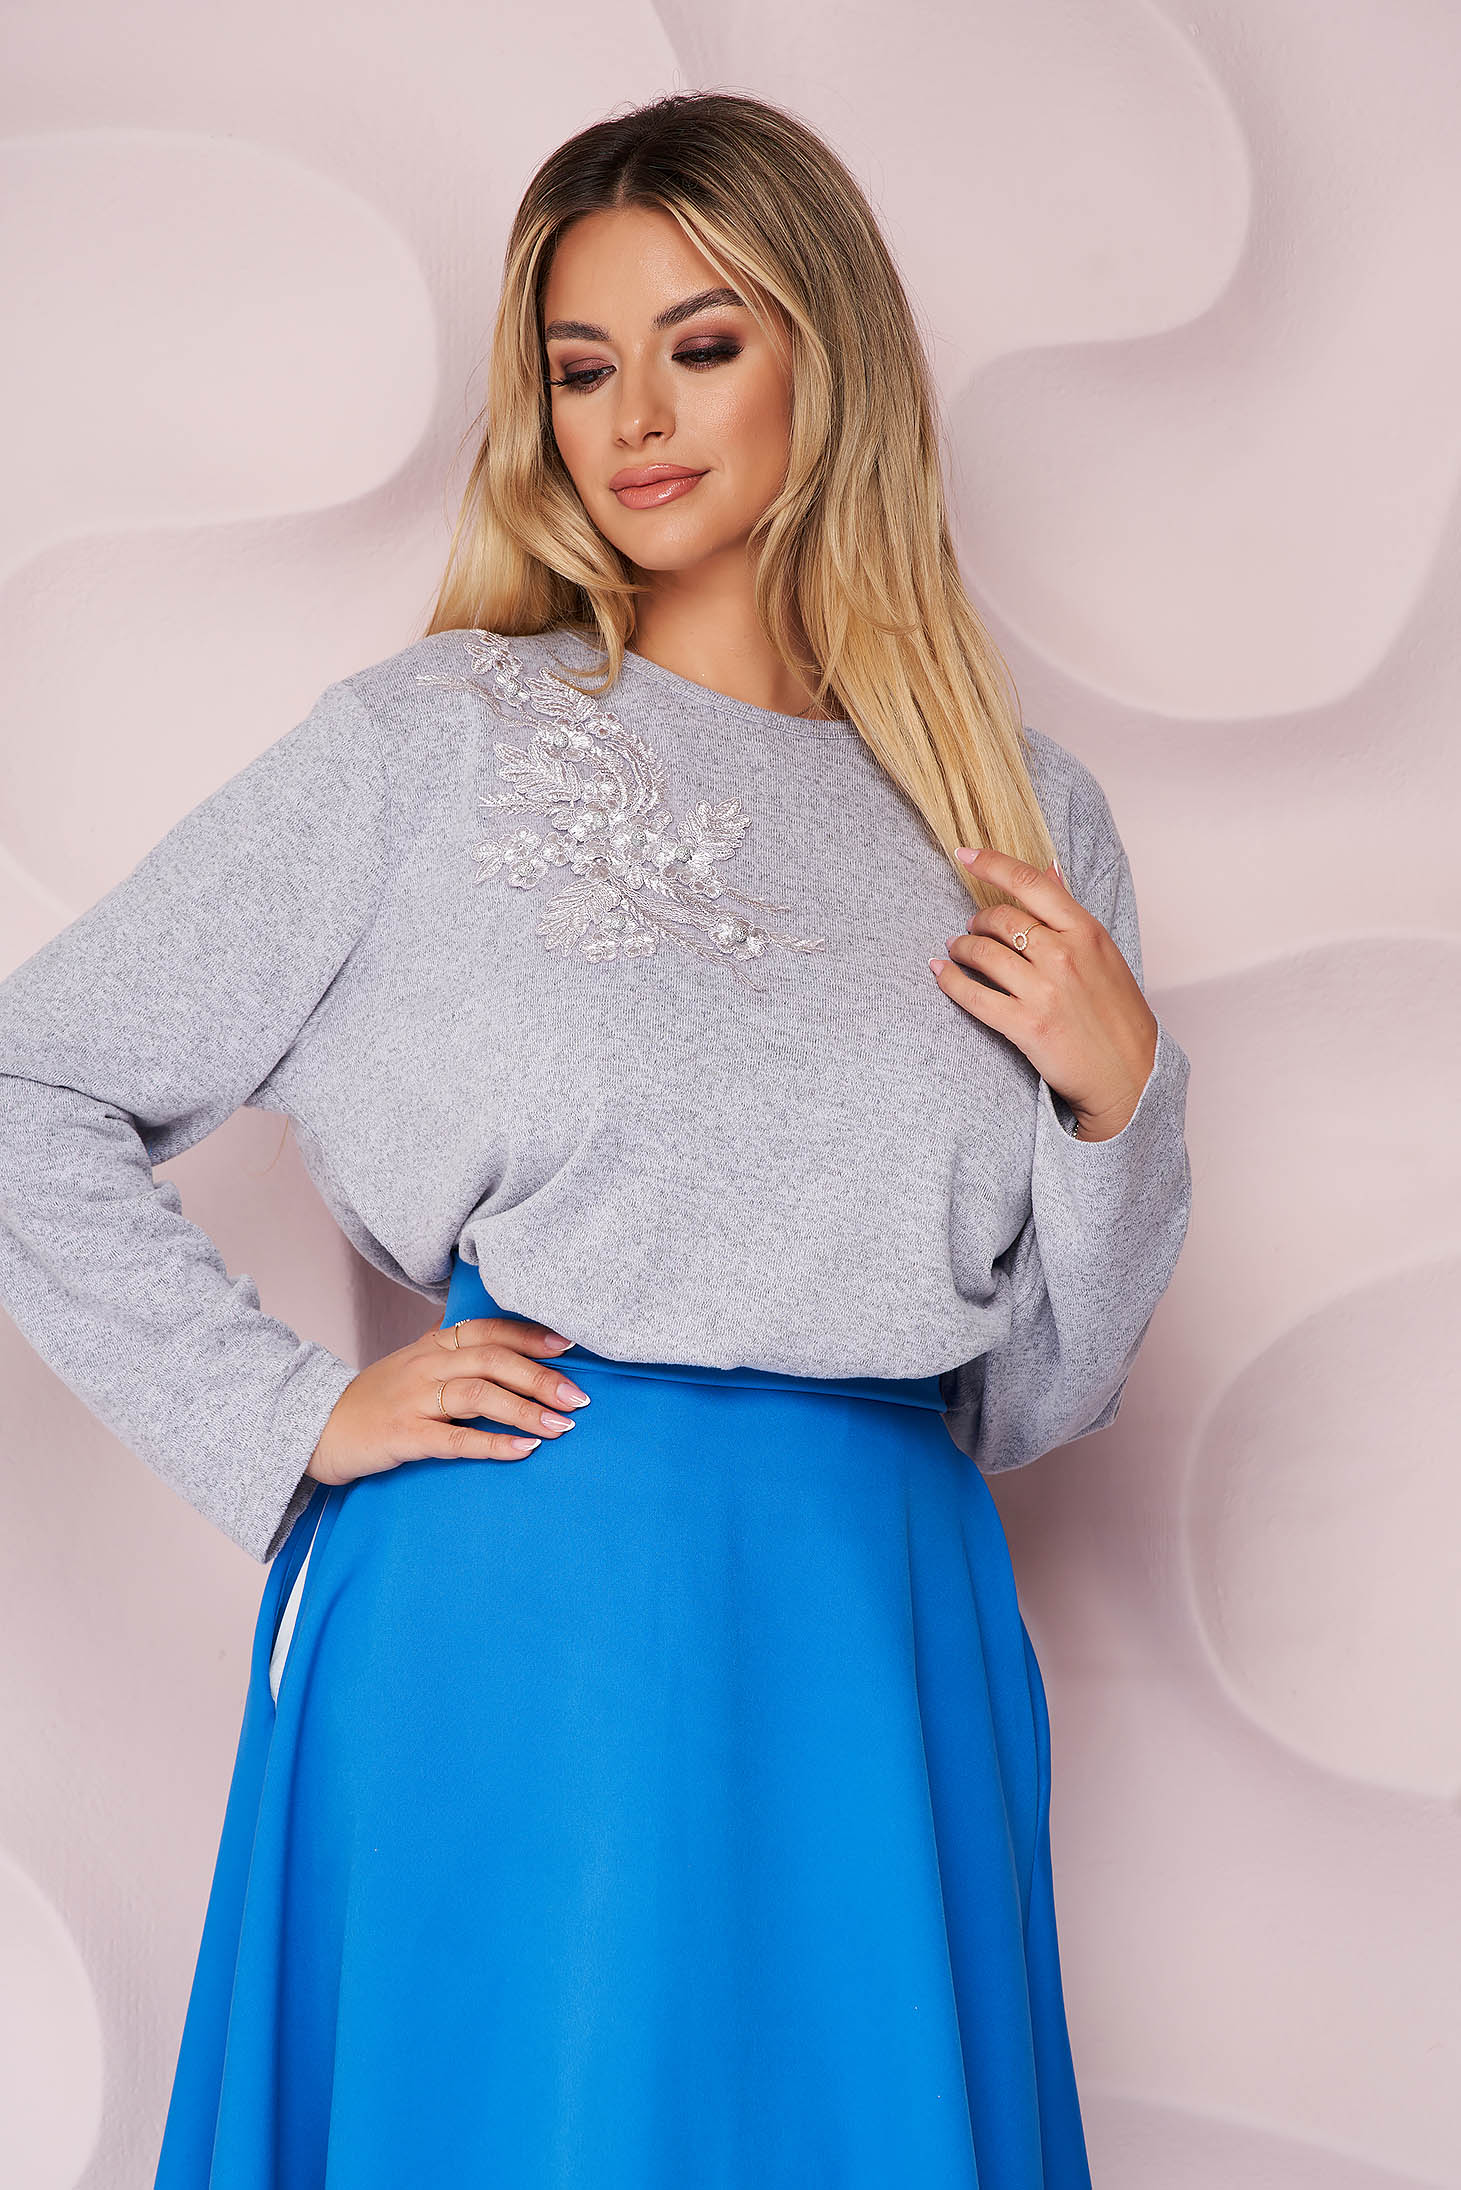 Pulover Lady Pandora lila office cu croi larg din material tricotat elastic si subtire si broderie florala